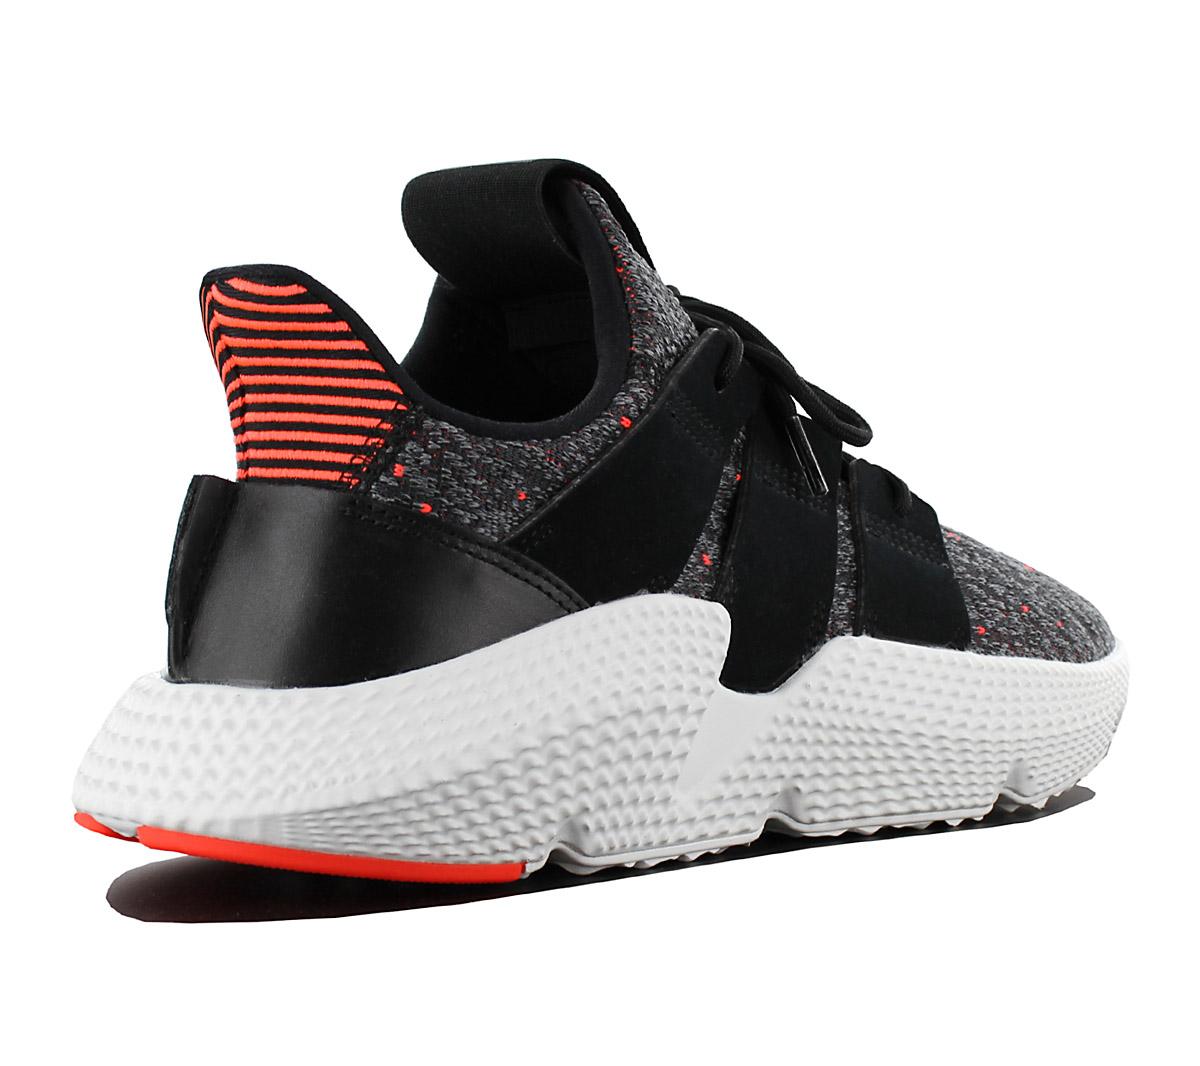 NEW adidas Prophere CQ3022 Men  s Shoes Trainers Sneakers SALE  c9d48afc5